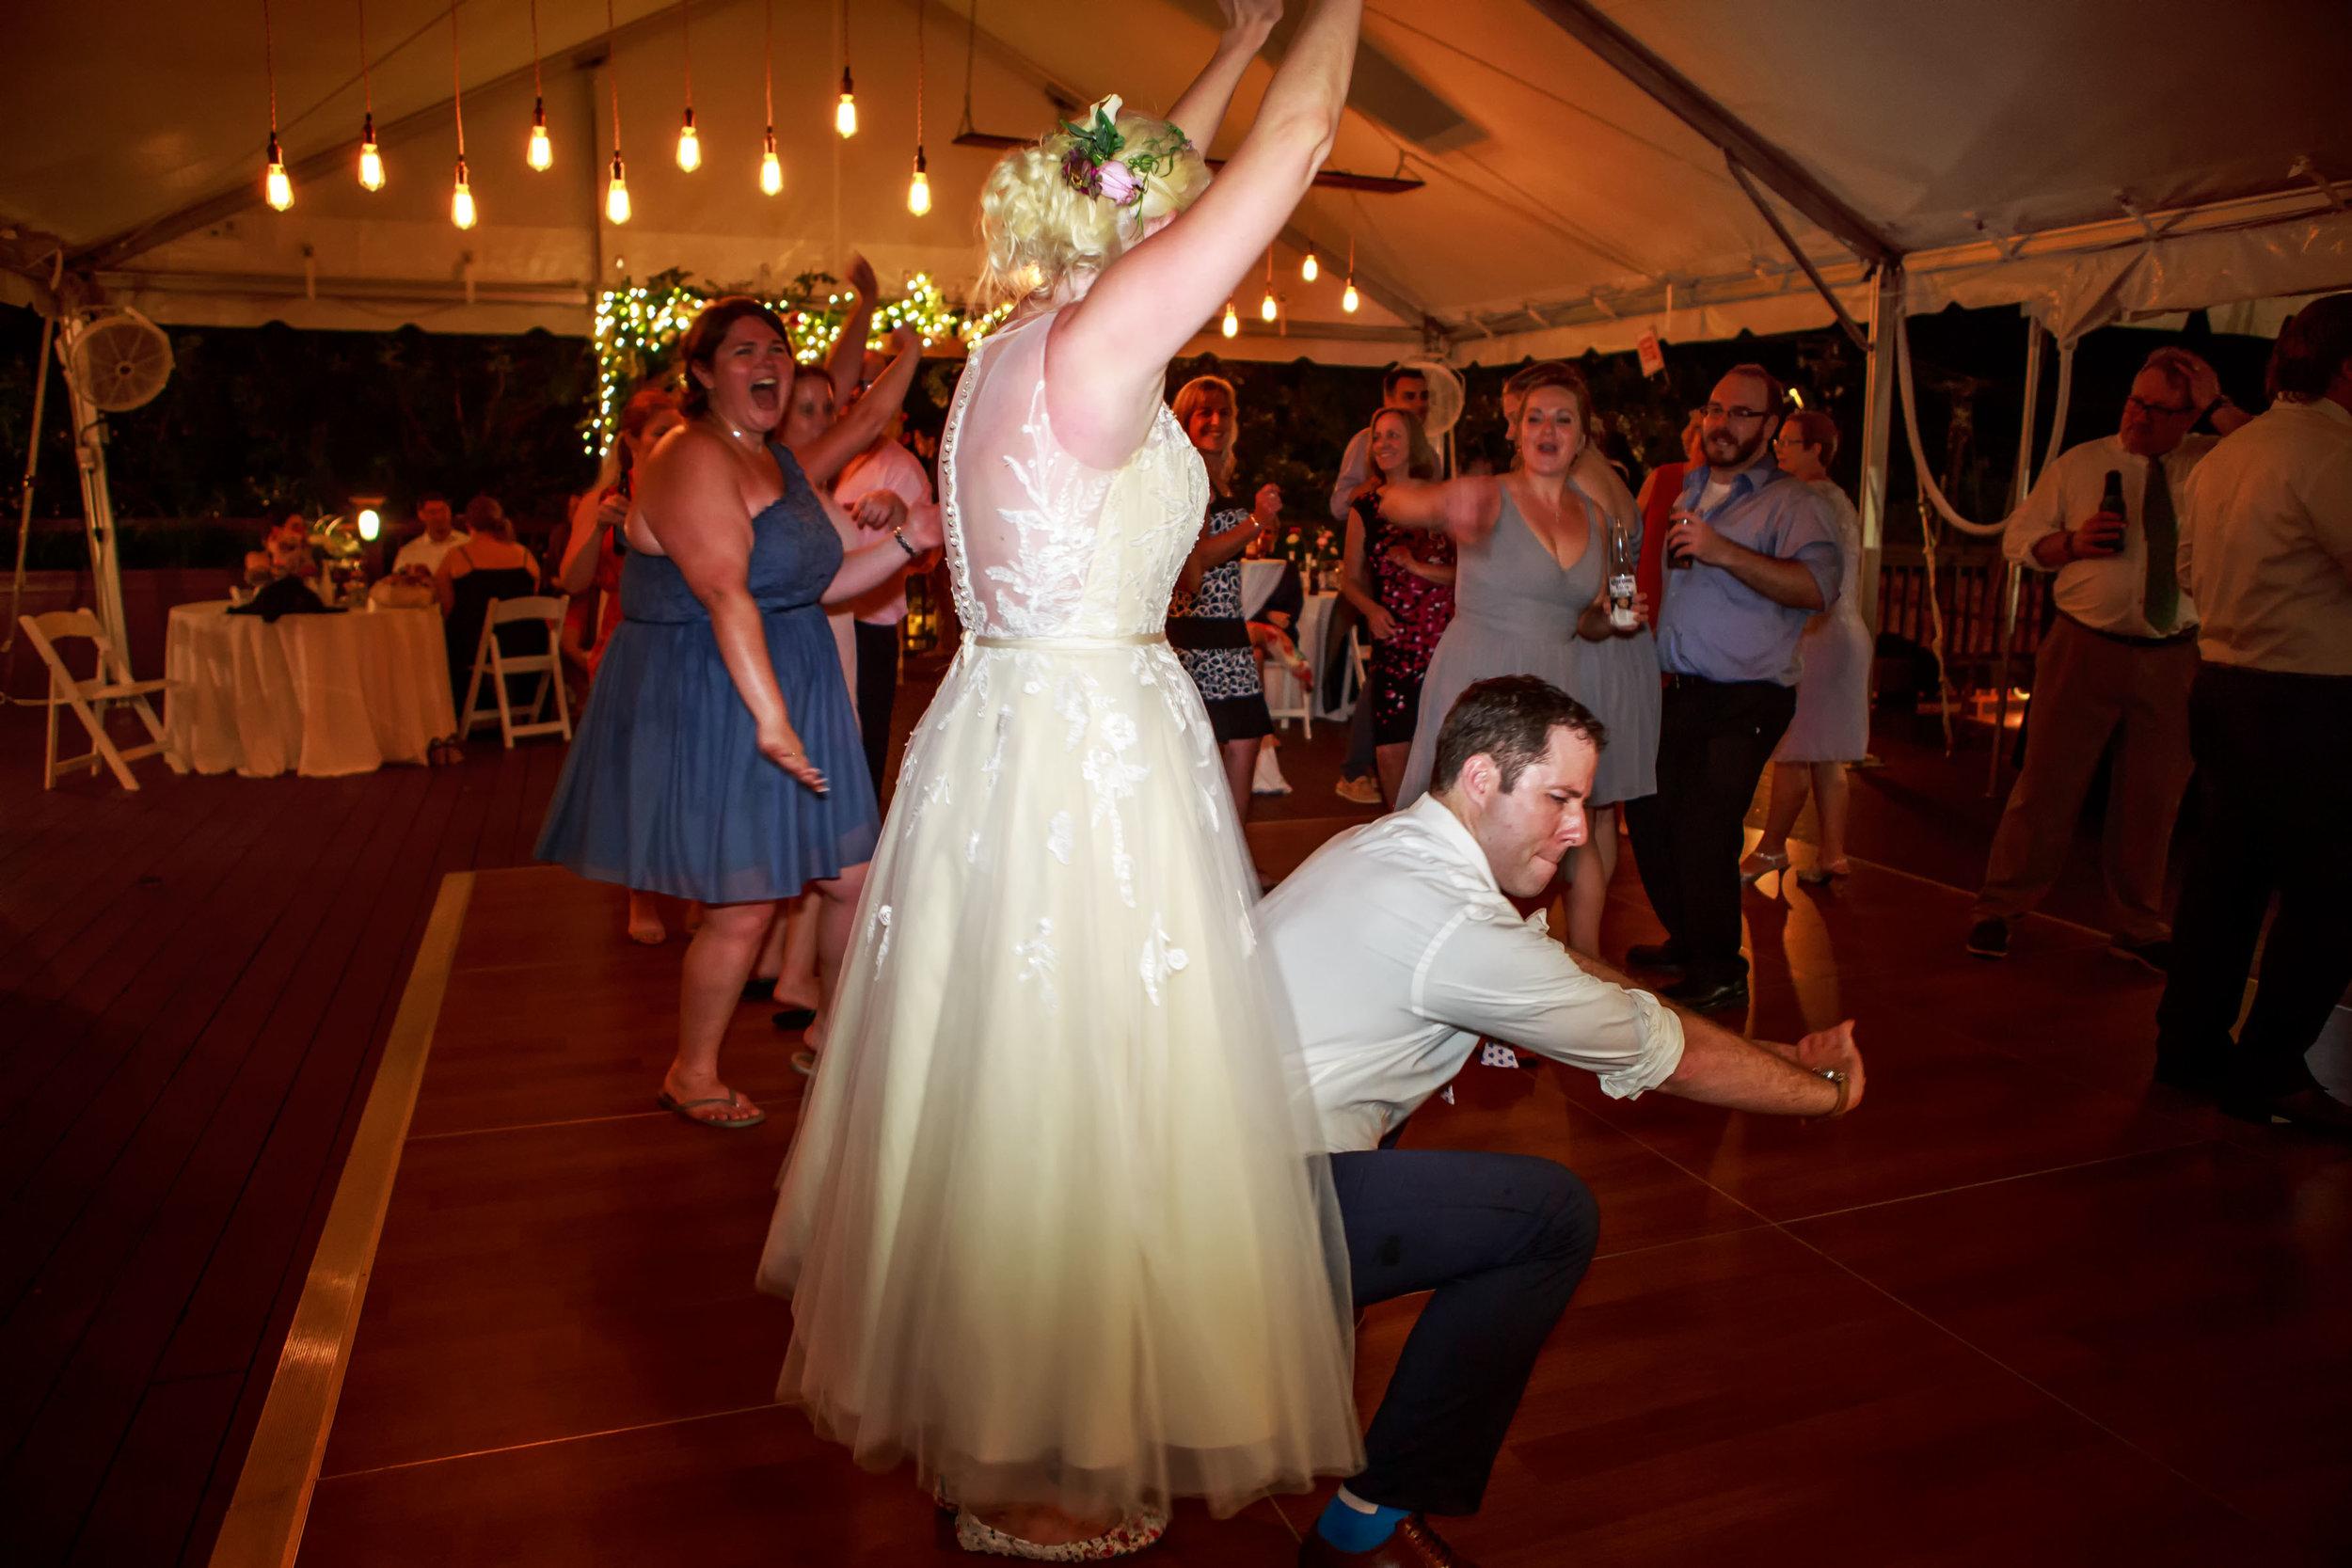 128-South-Wedding-Wilmington-NC-Photographer-Reception-270.jpg